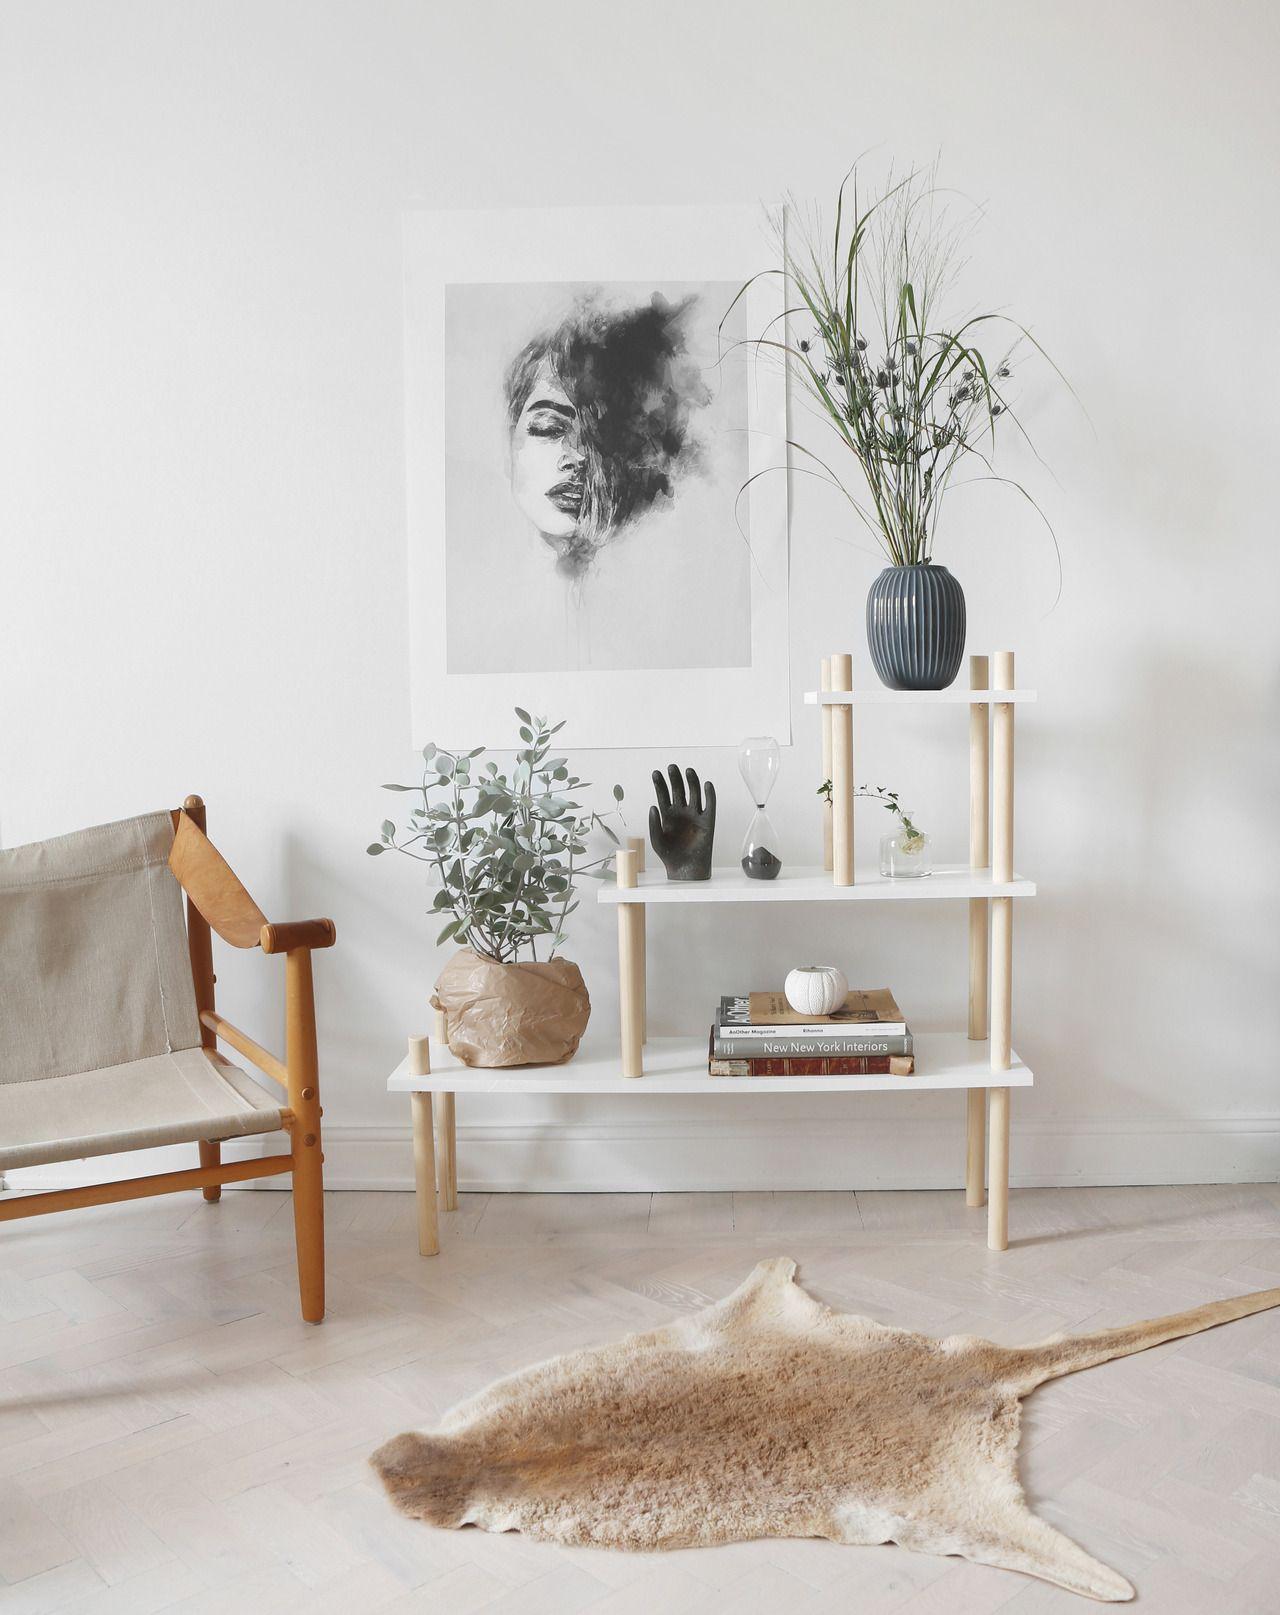 nordic style furniture. 3 Fina DIY-projekt Av Trä \u2022 Husligheter. Bookshelf DiyScandinavian InteriorScandinavian StyleInterior Nordic Style Furniture